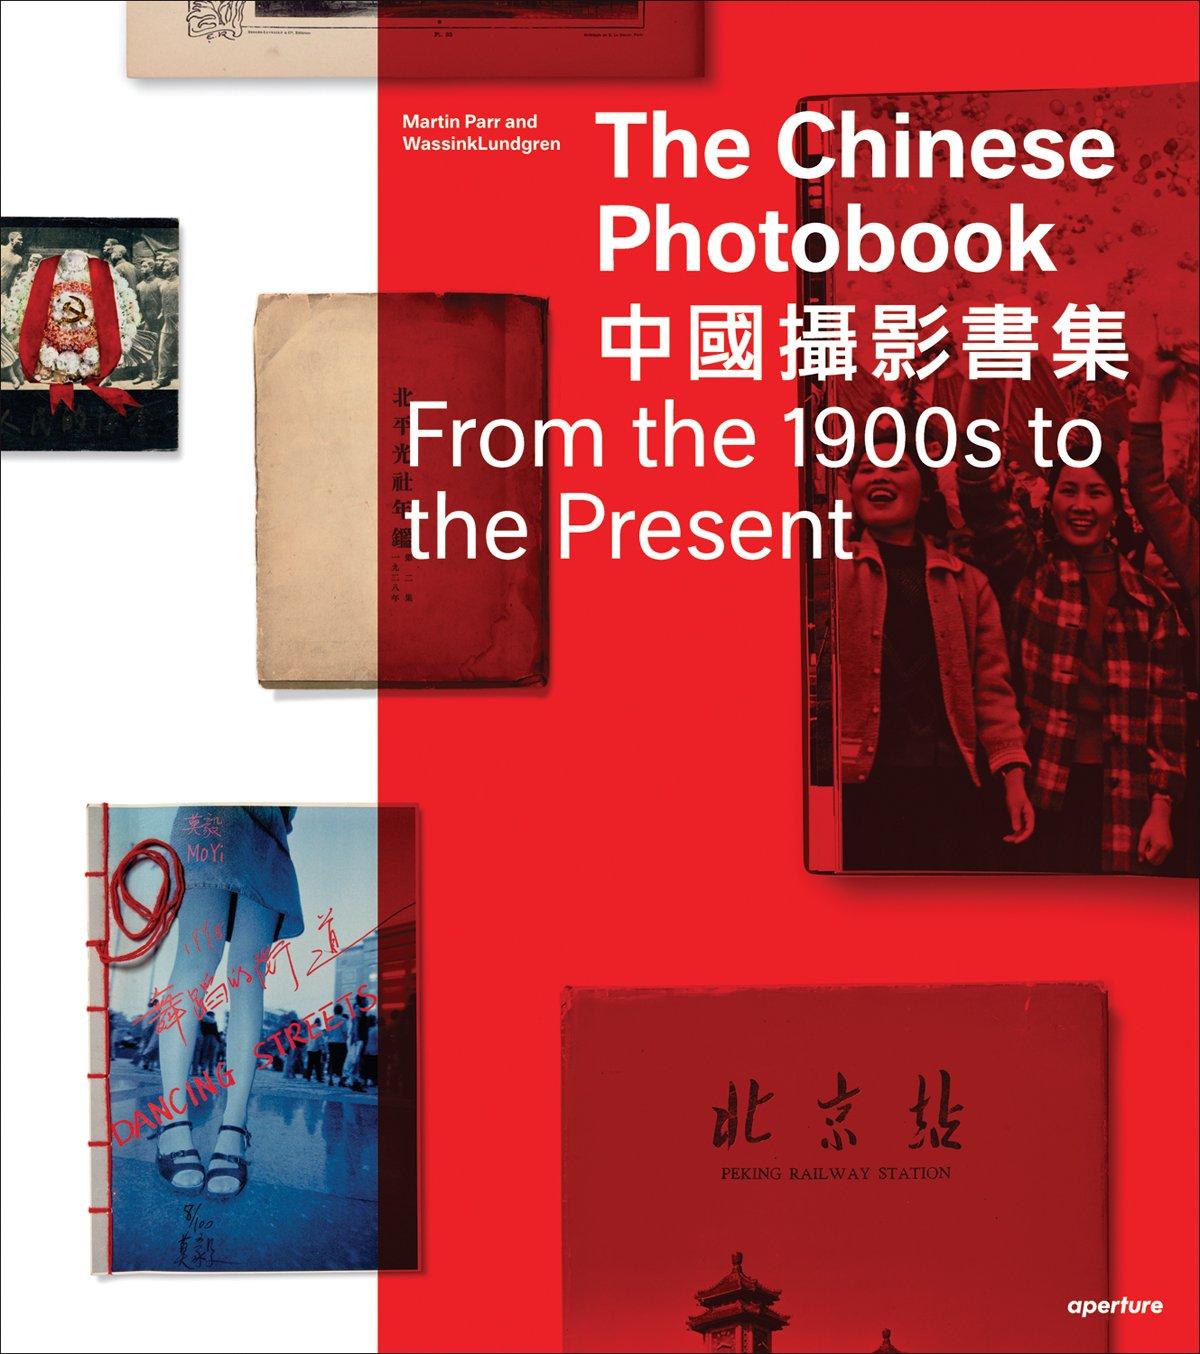 The Chinese Photobook. 中國攝影書集